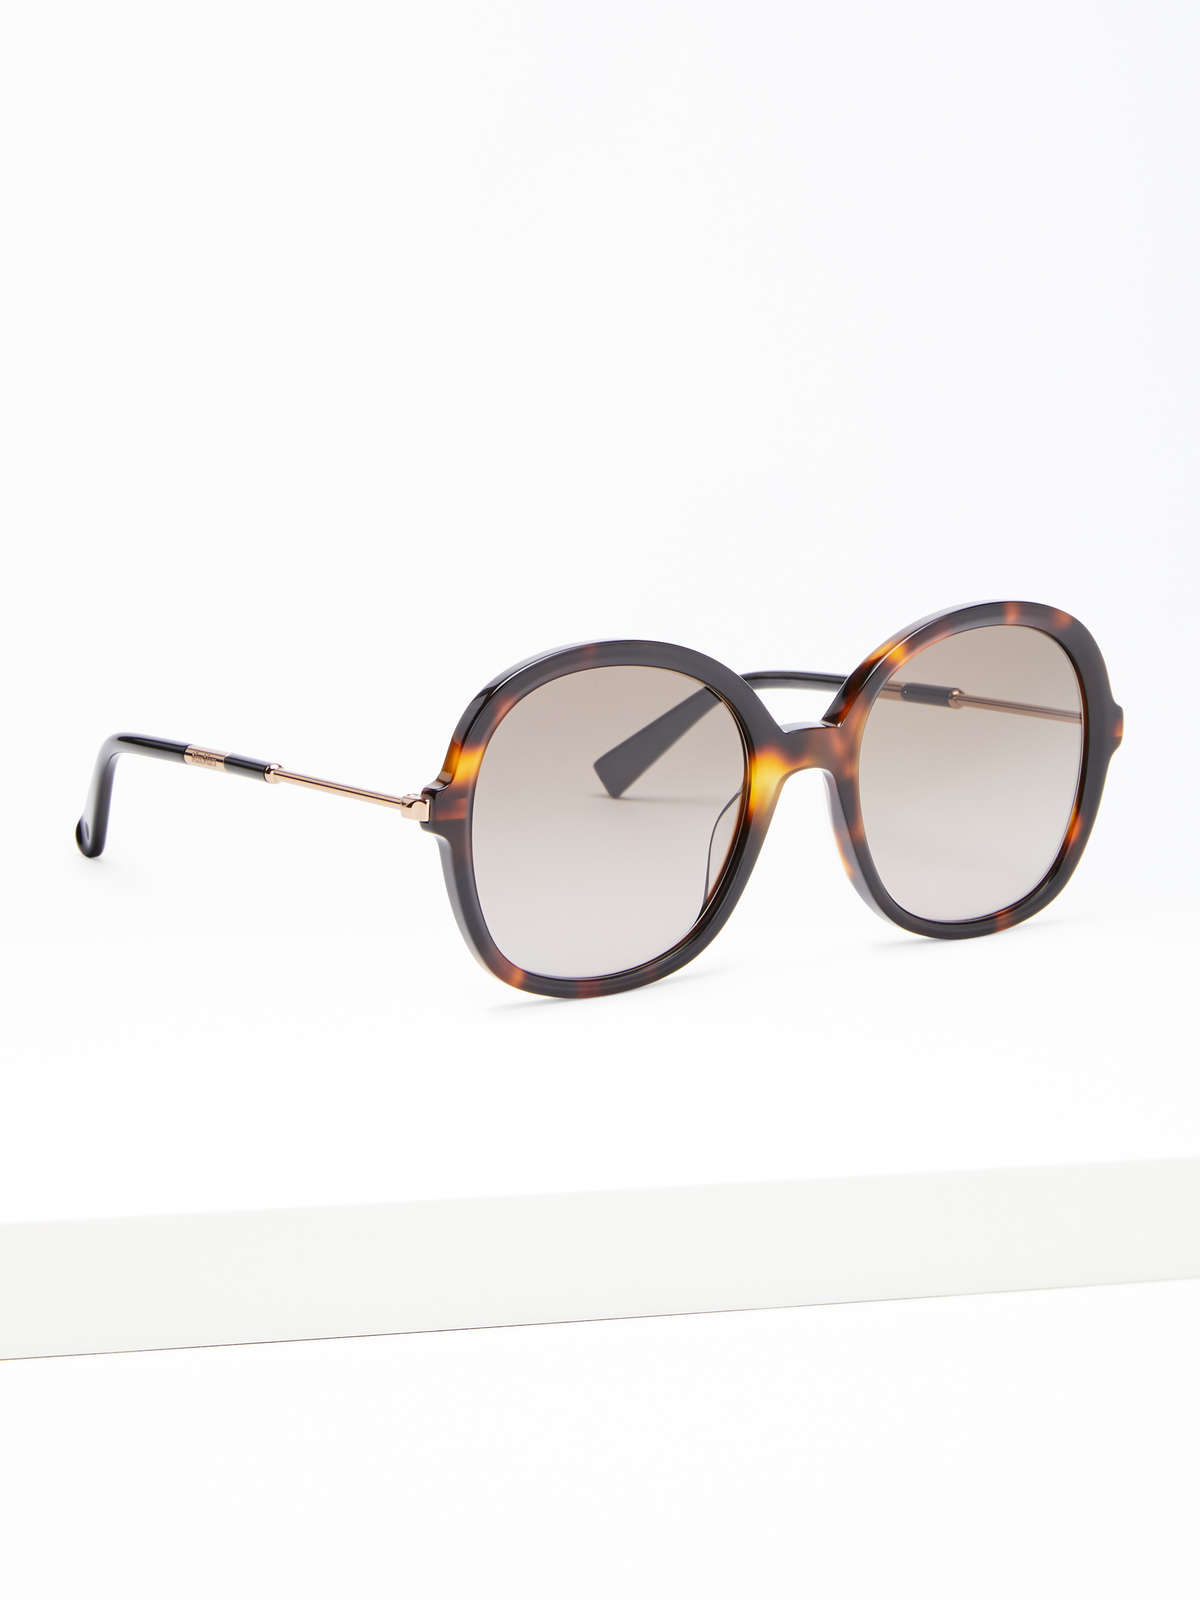 Max Mara - Oversize-Sonnenbrille - 6